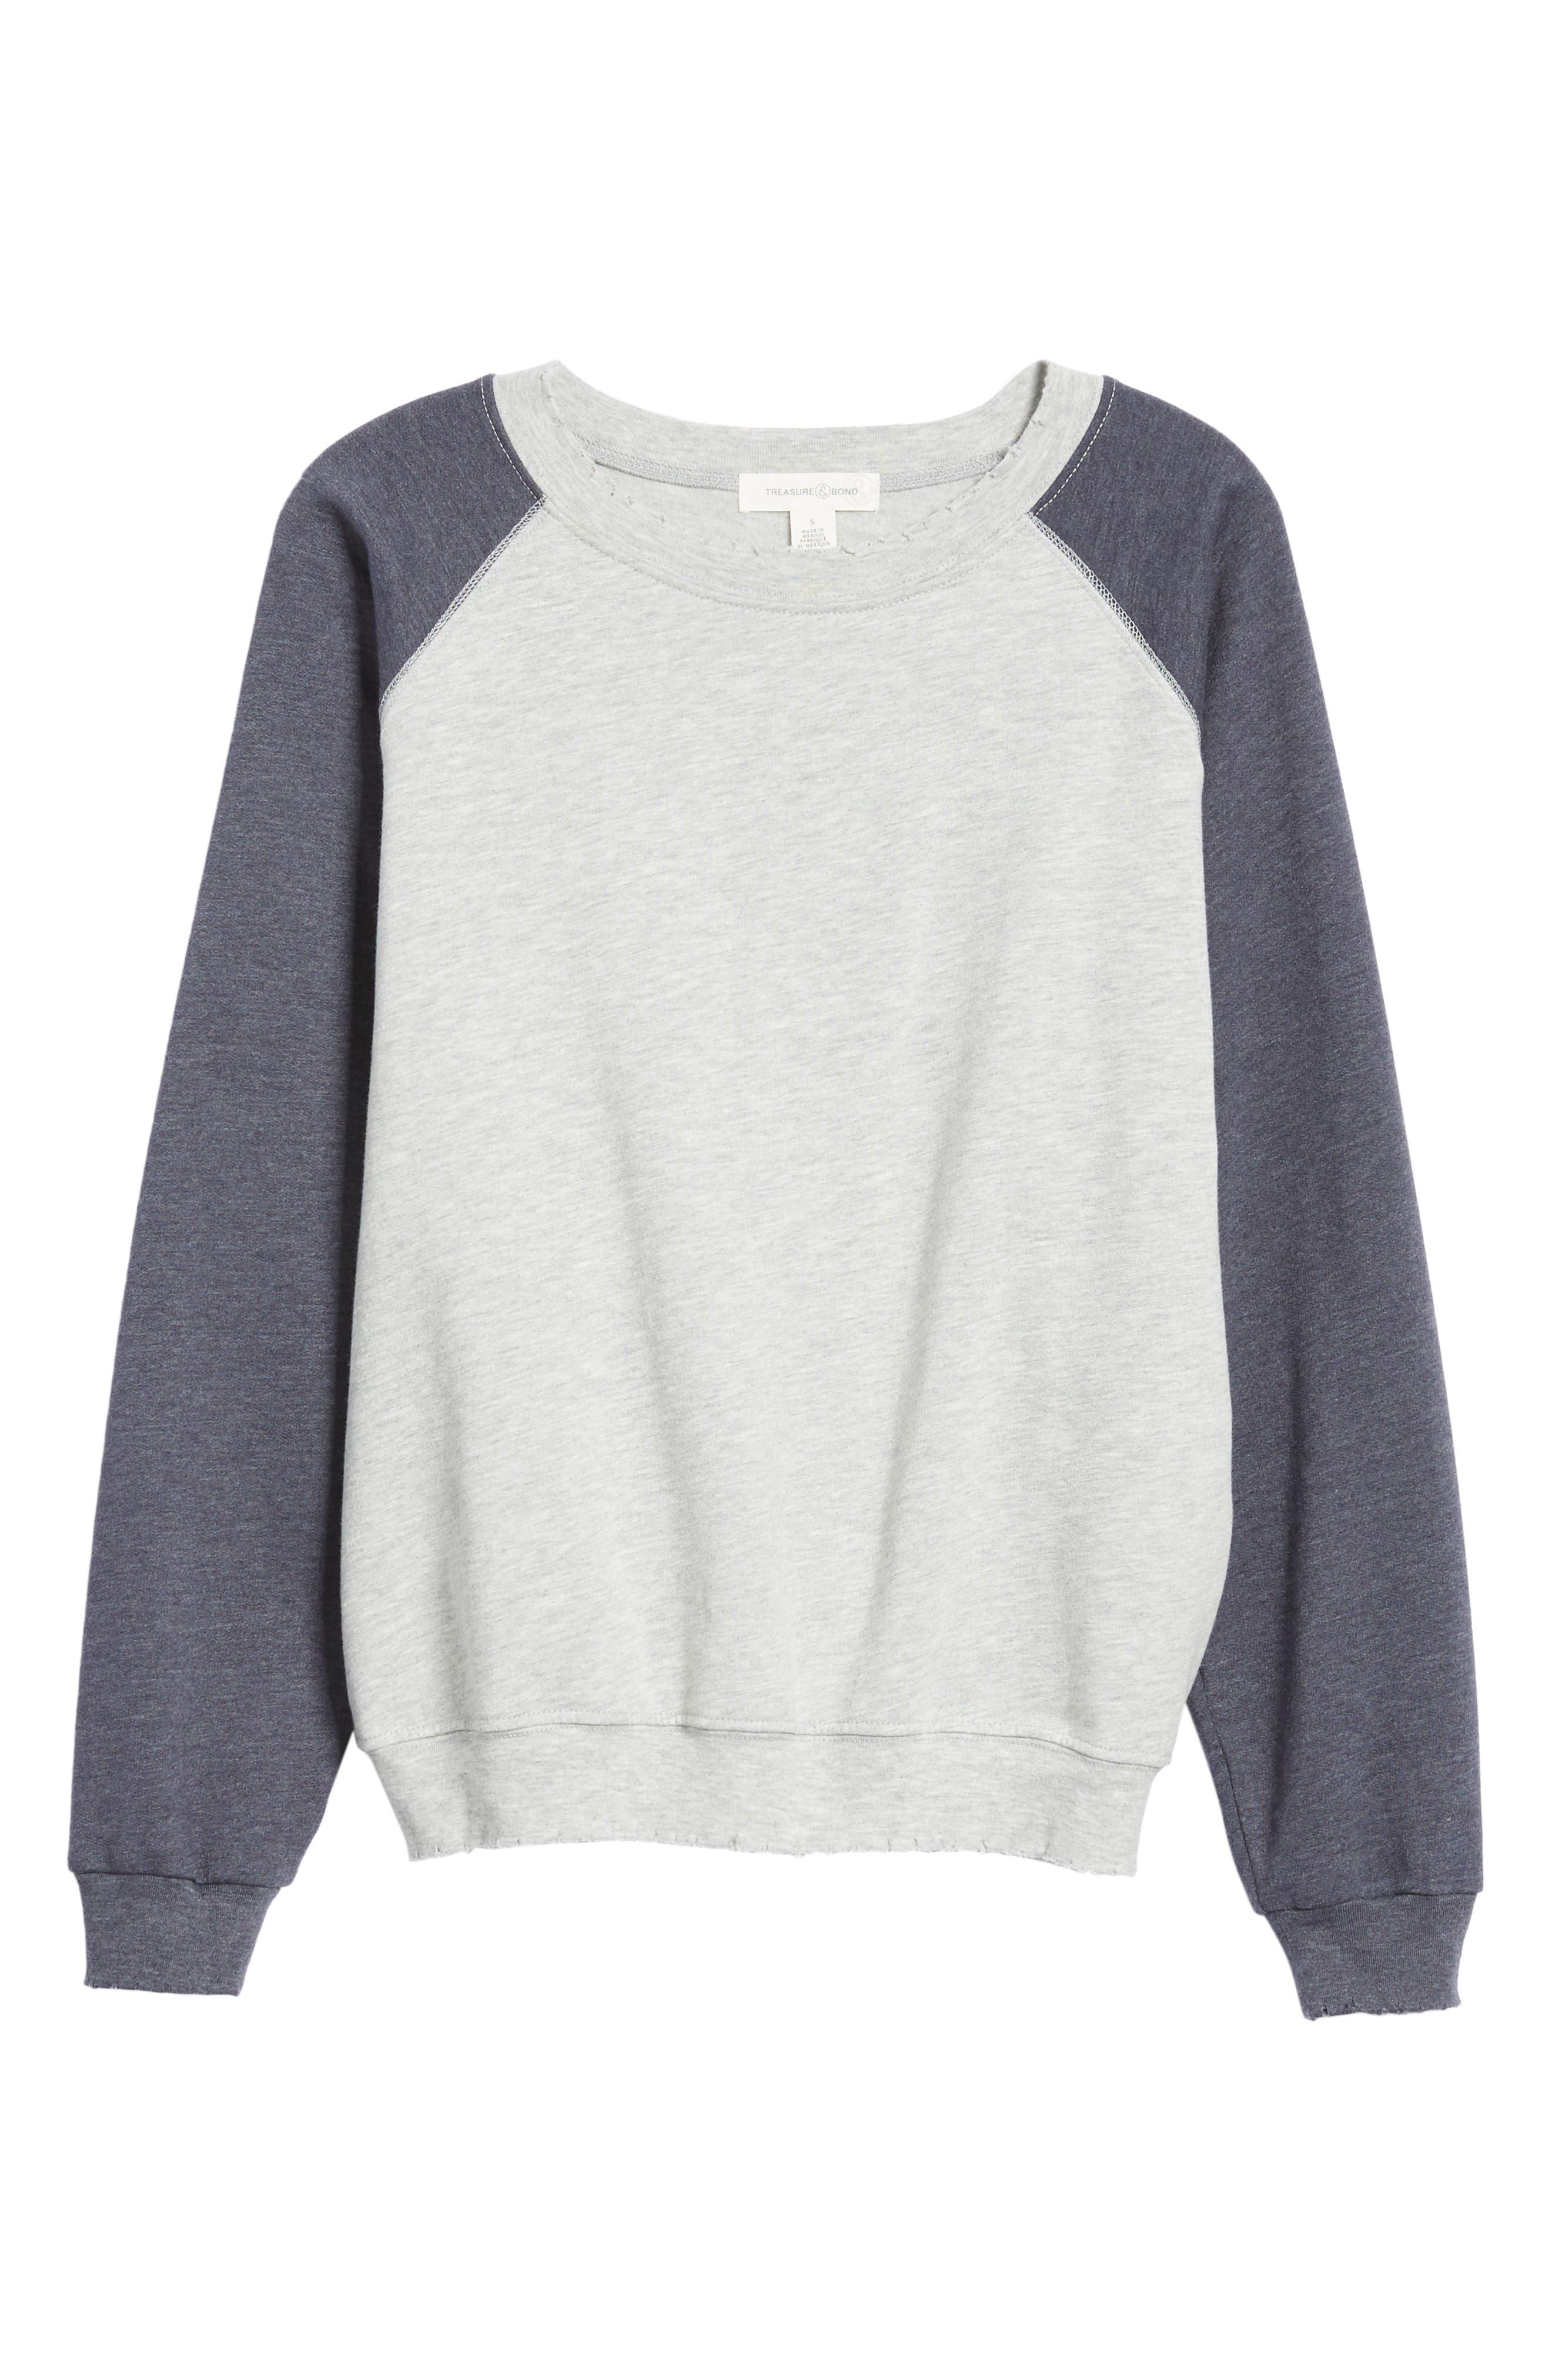 Raglan Sweatshirt,                             Alternate thumbnail 6, color,                             GREY HEATHER- NAVY COMBO